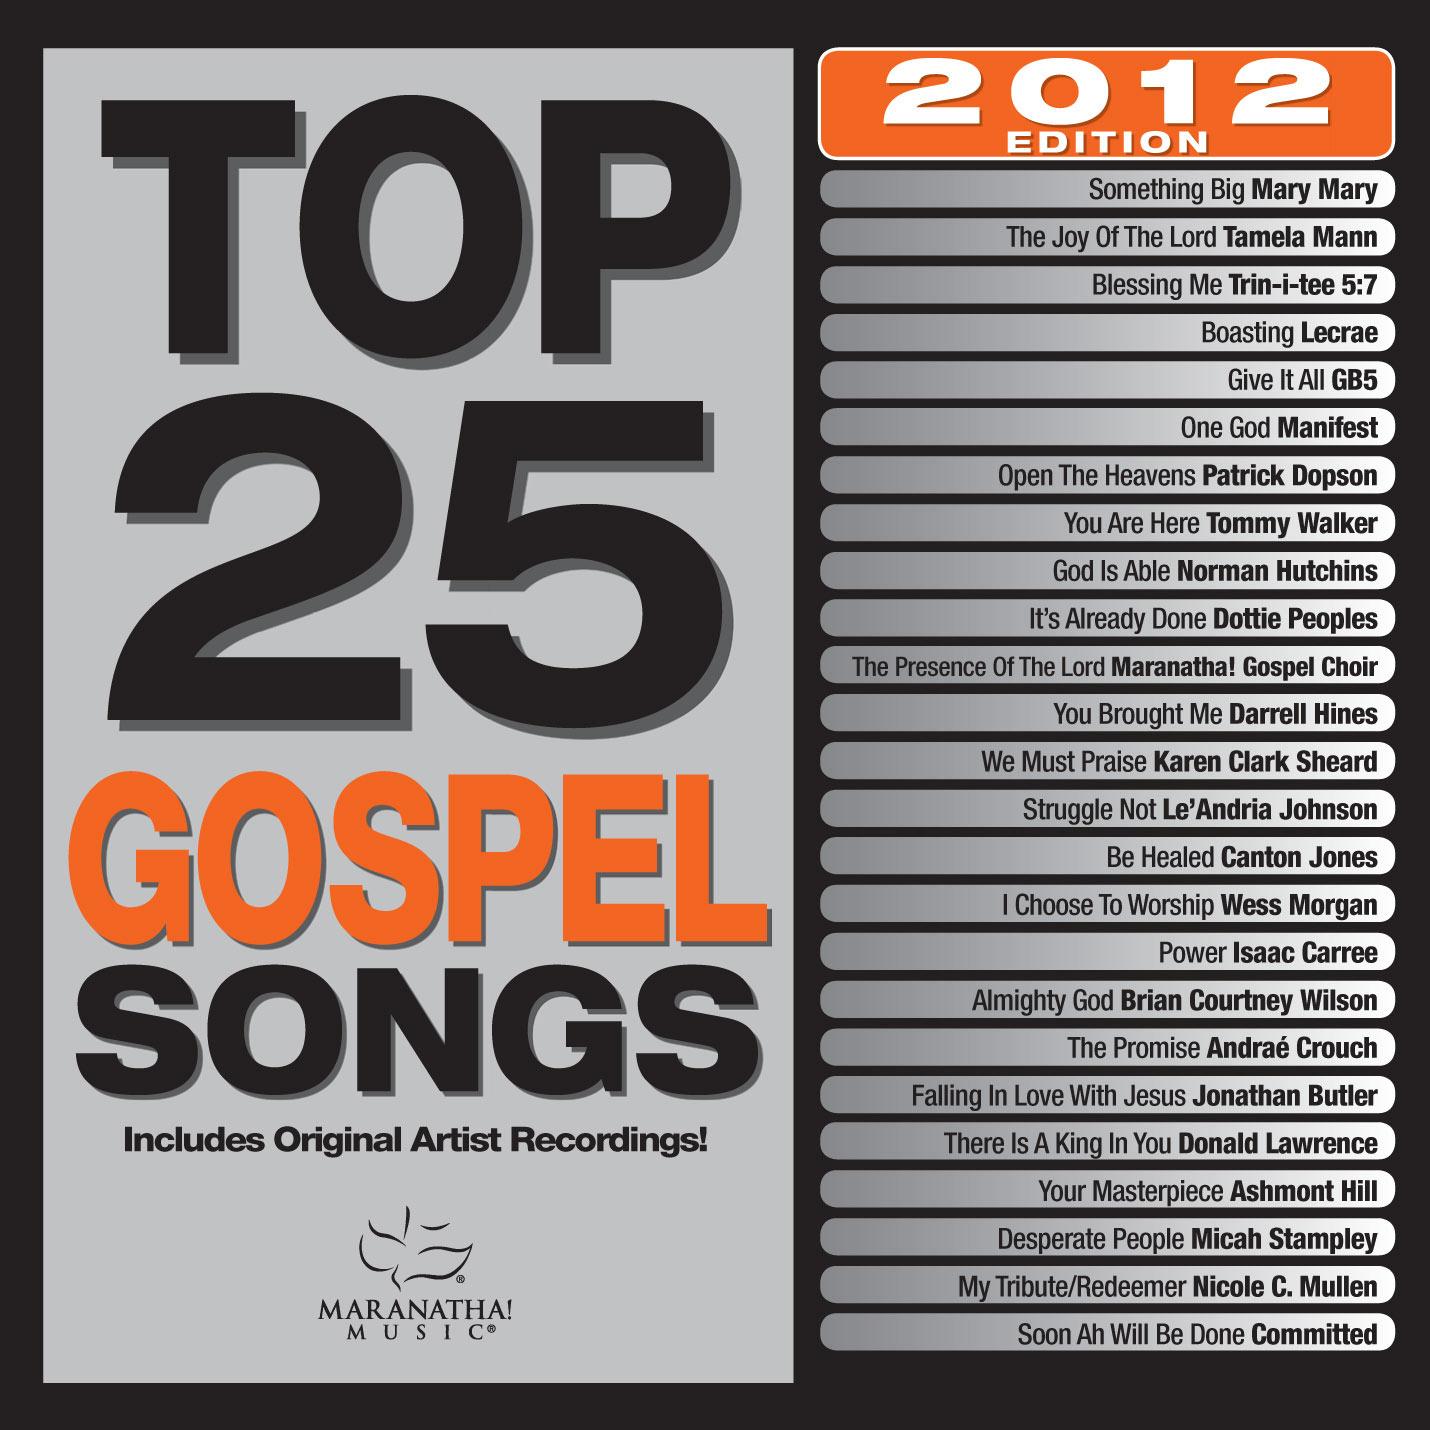 Maranatha! Music Releases Top 25 Gospel Songs 2012 Featuring Legendary